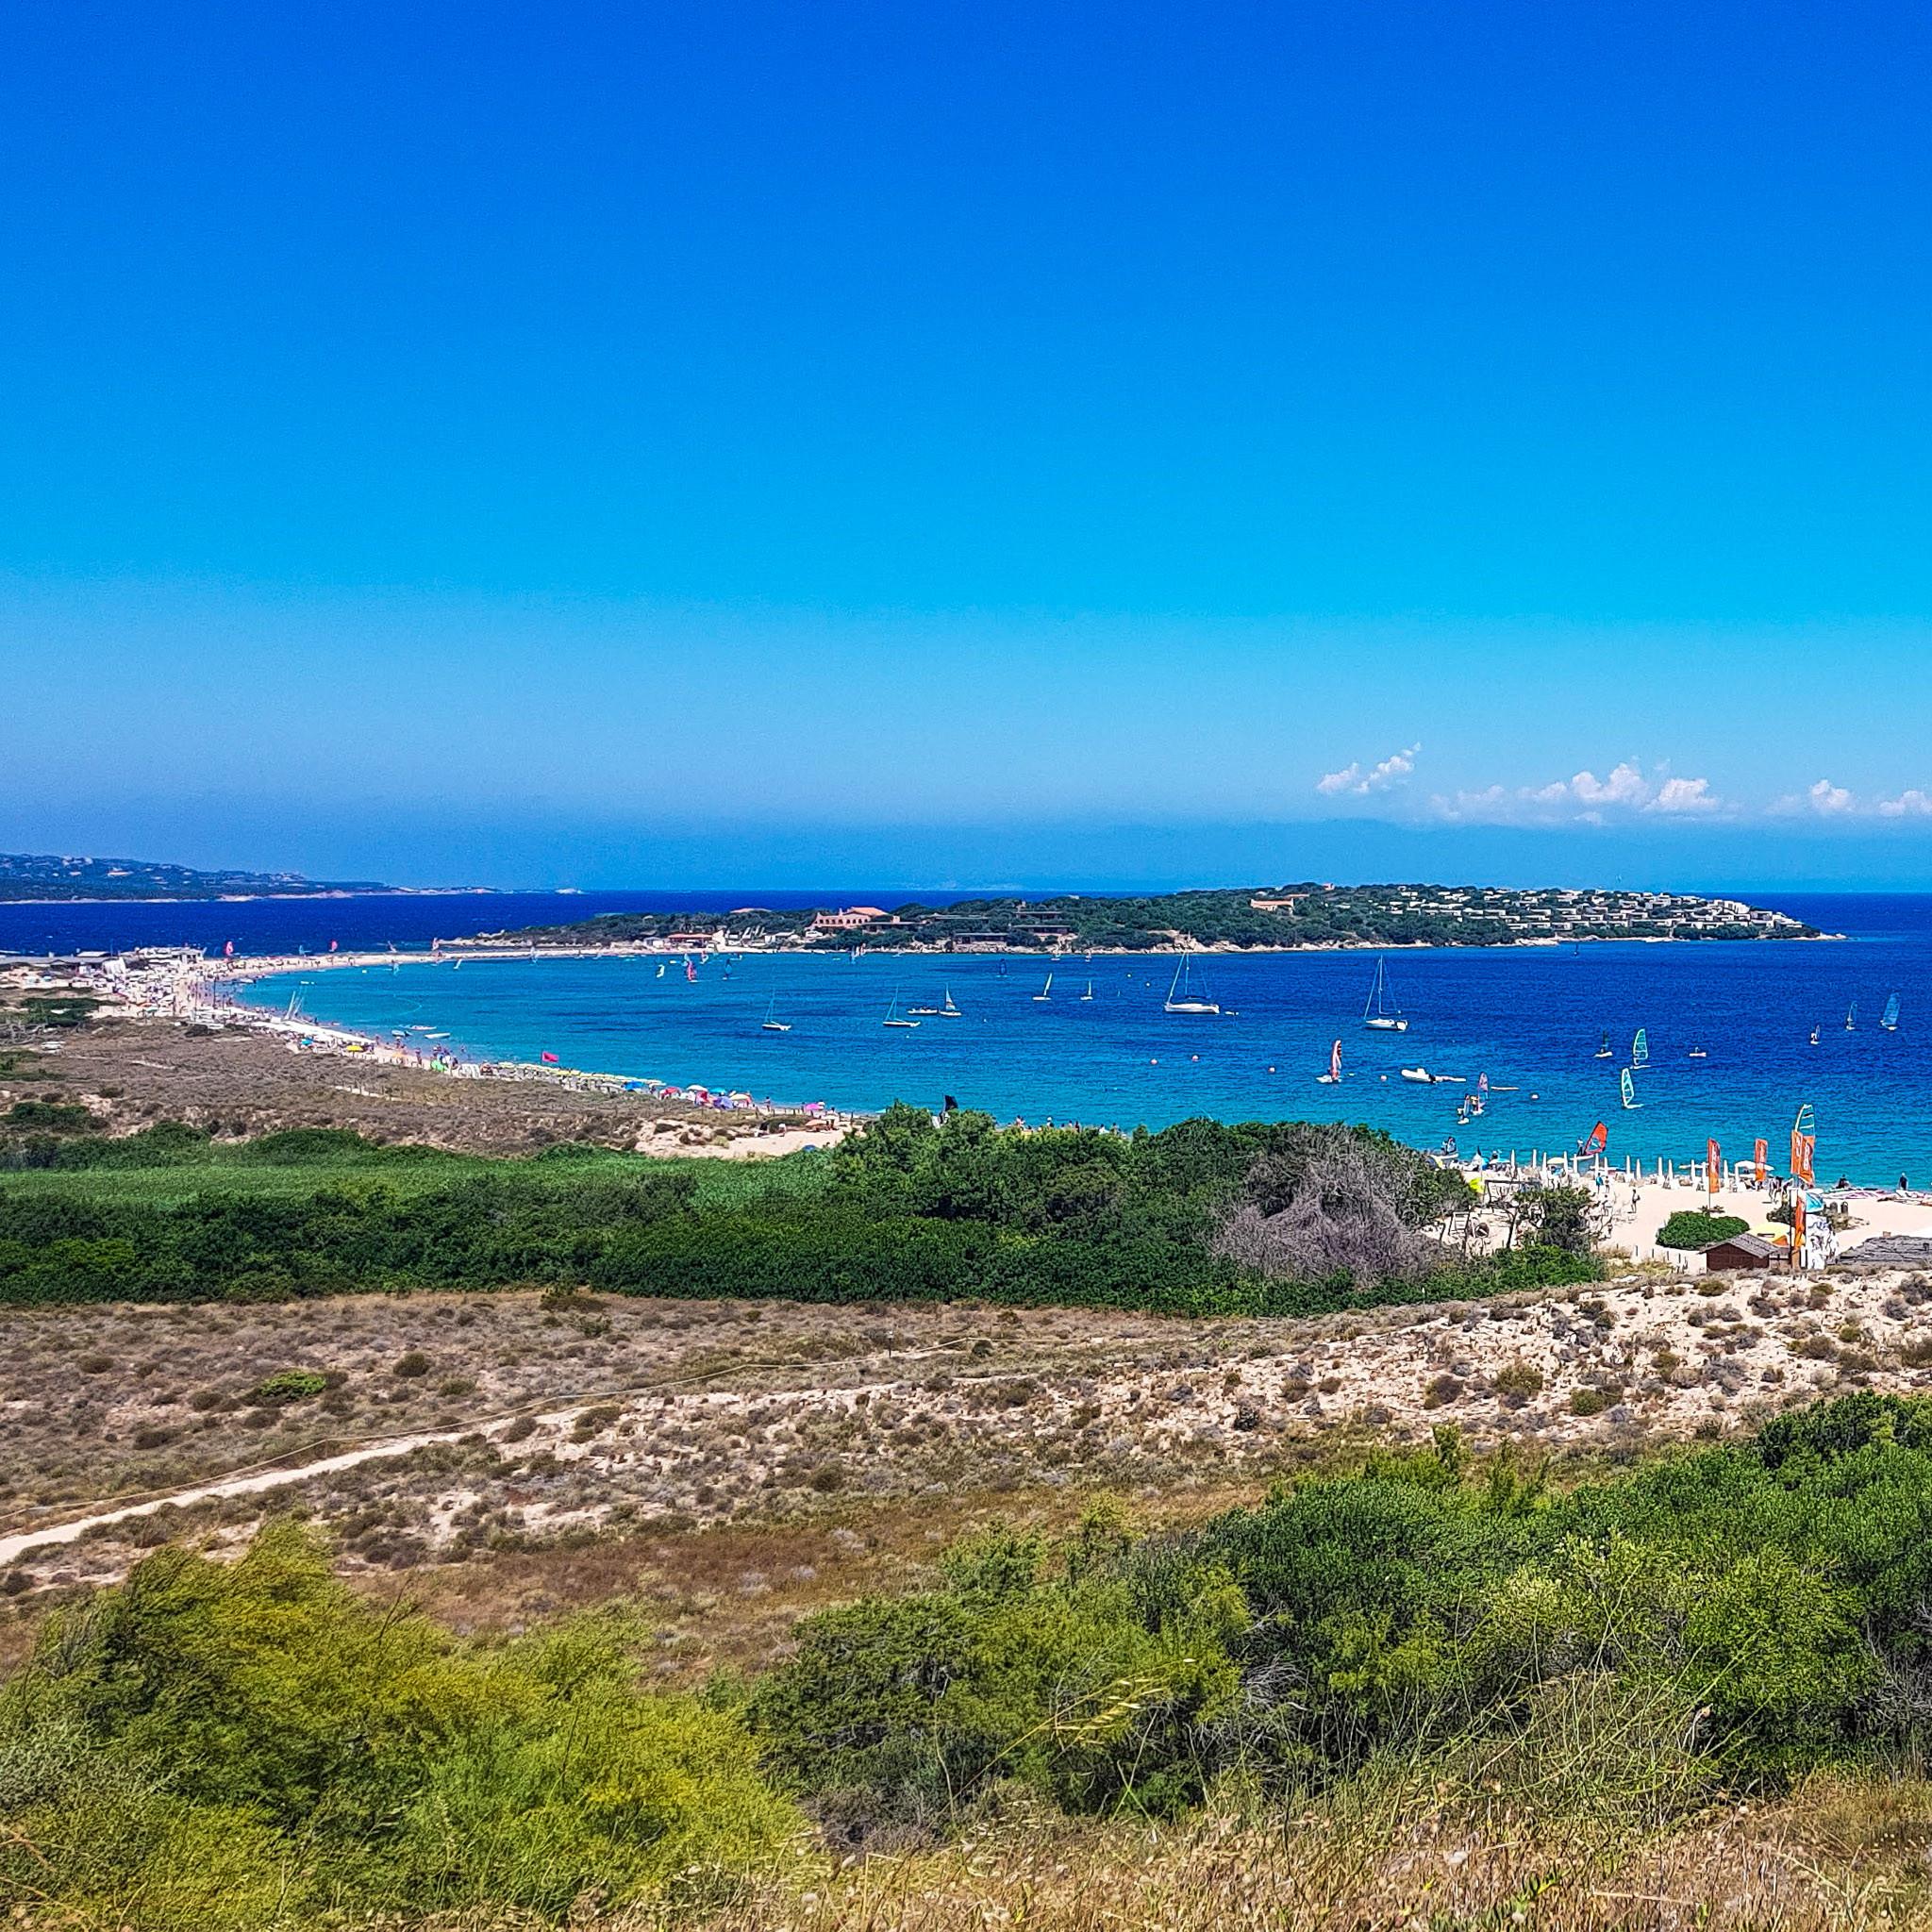 Porto Pollo, Sardinia